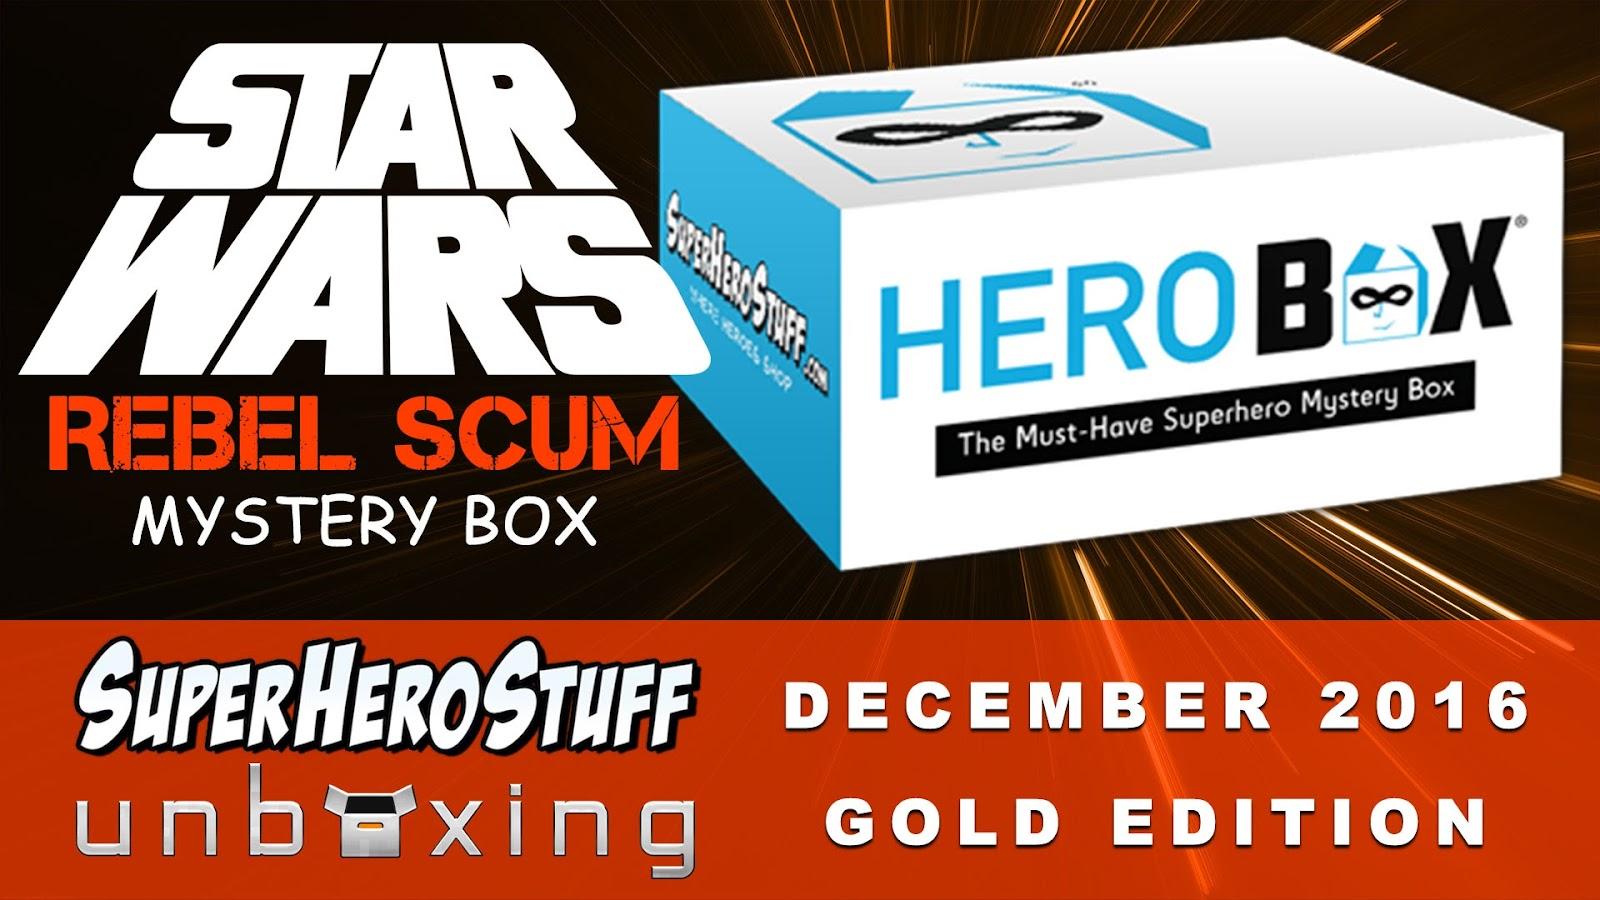 HeroBox Gold Edition Unboxing SuperHeroStuff